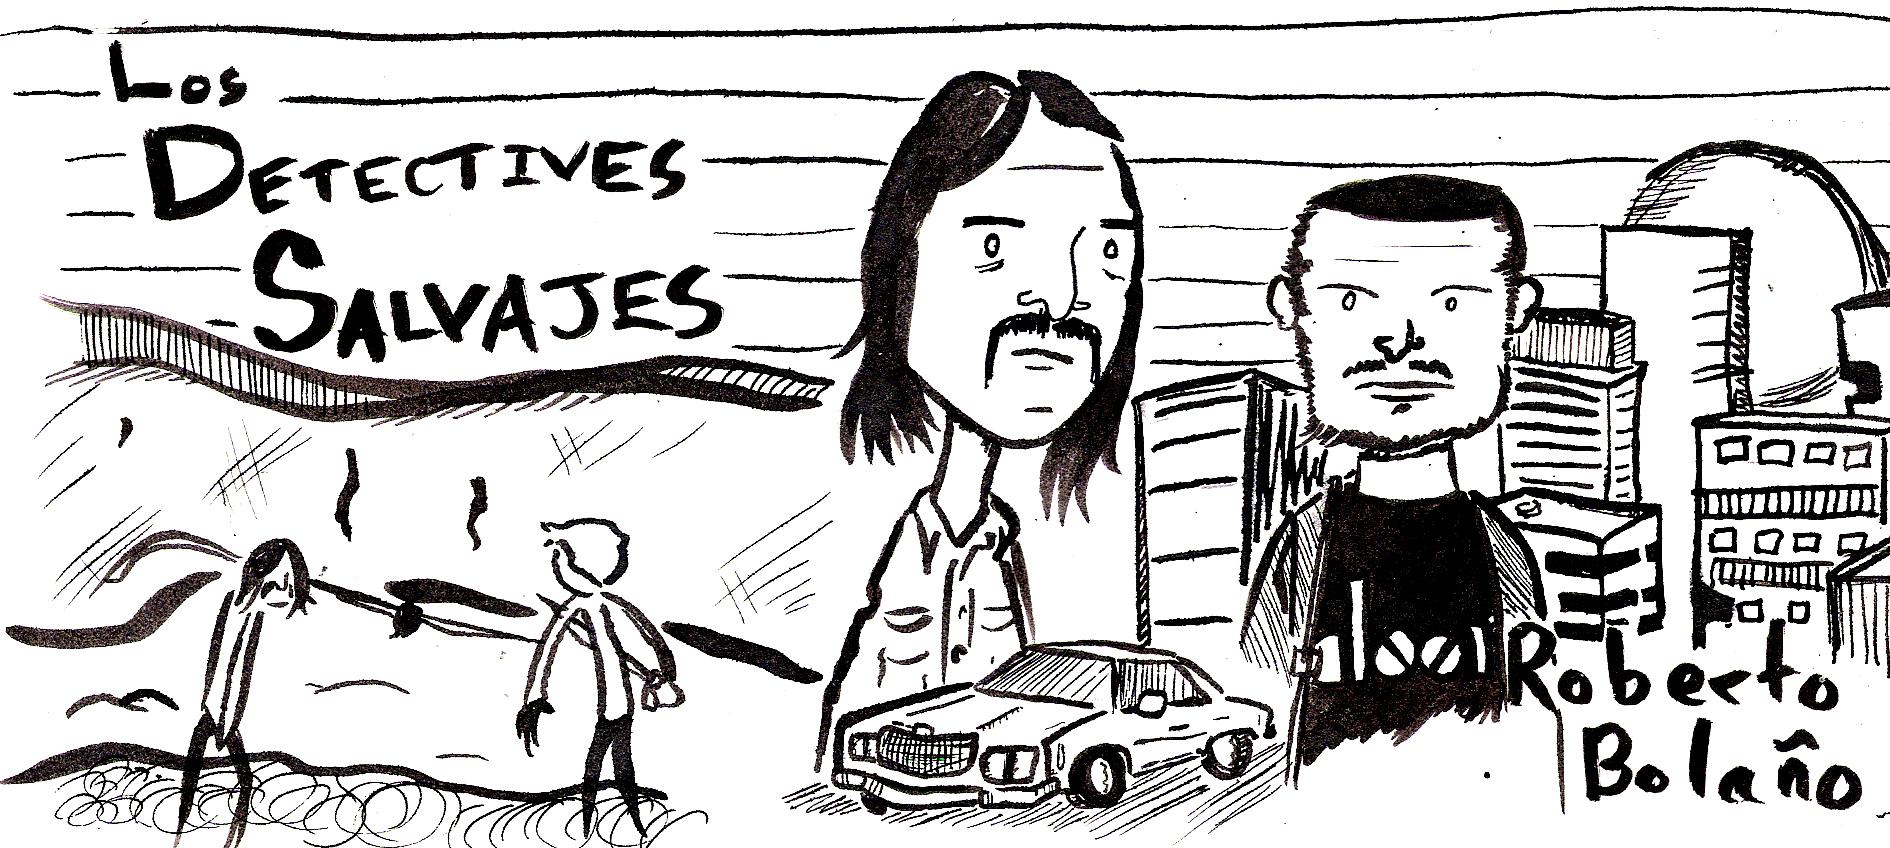 savage-detectives.jpg